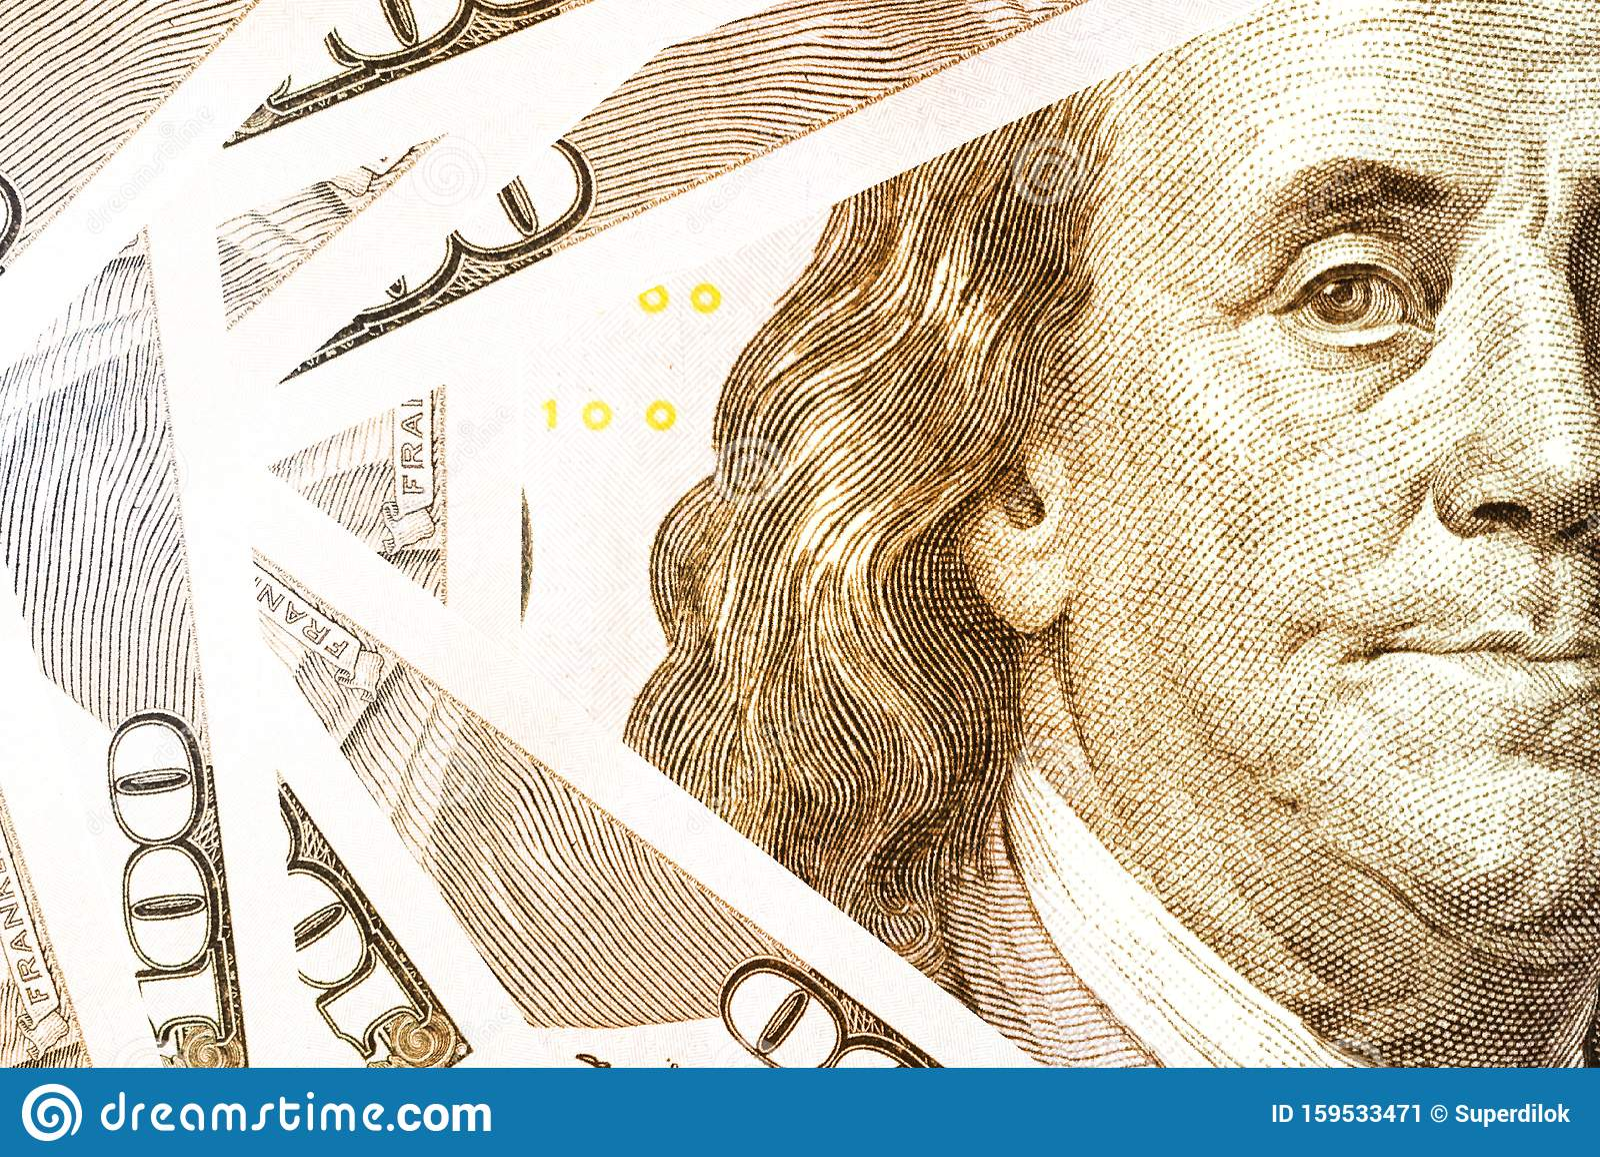 Benjamin Franklin Face On Us Dollar Banknote Us Dollar Is